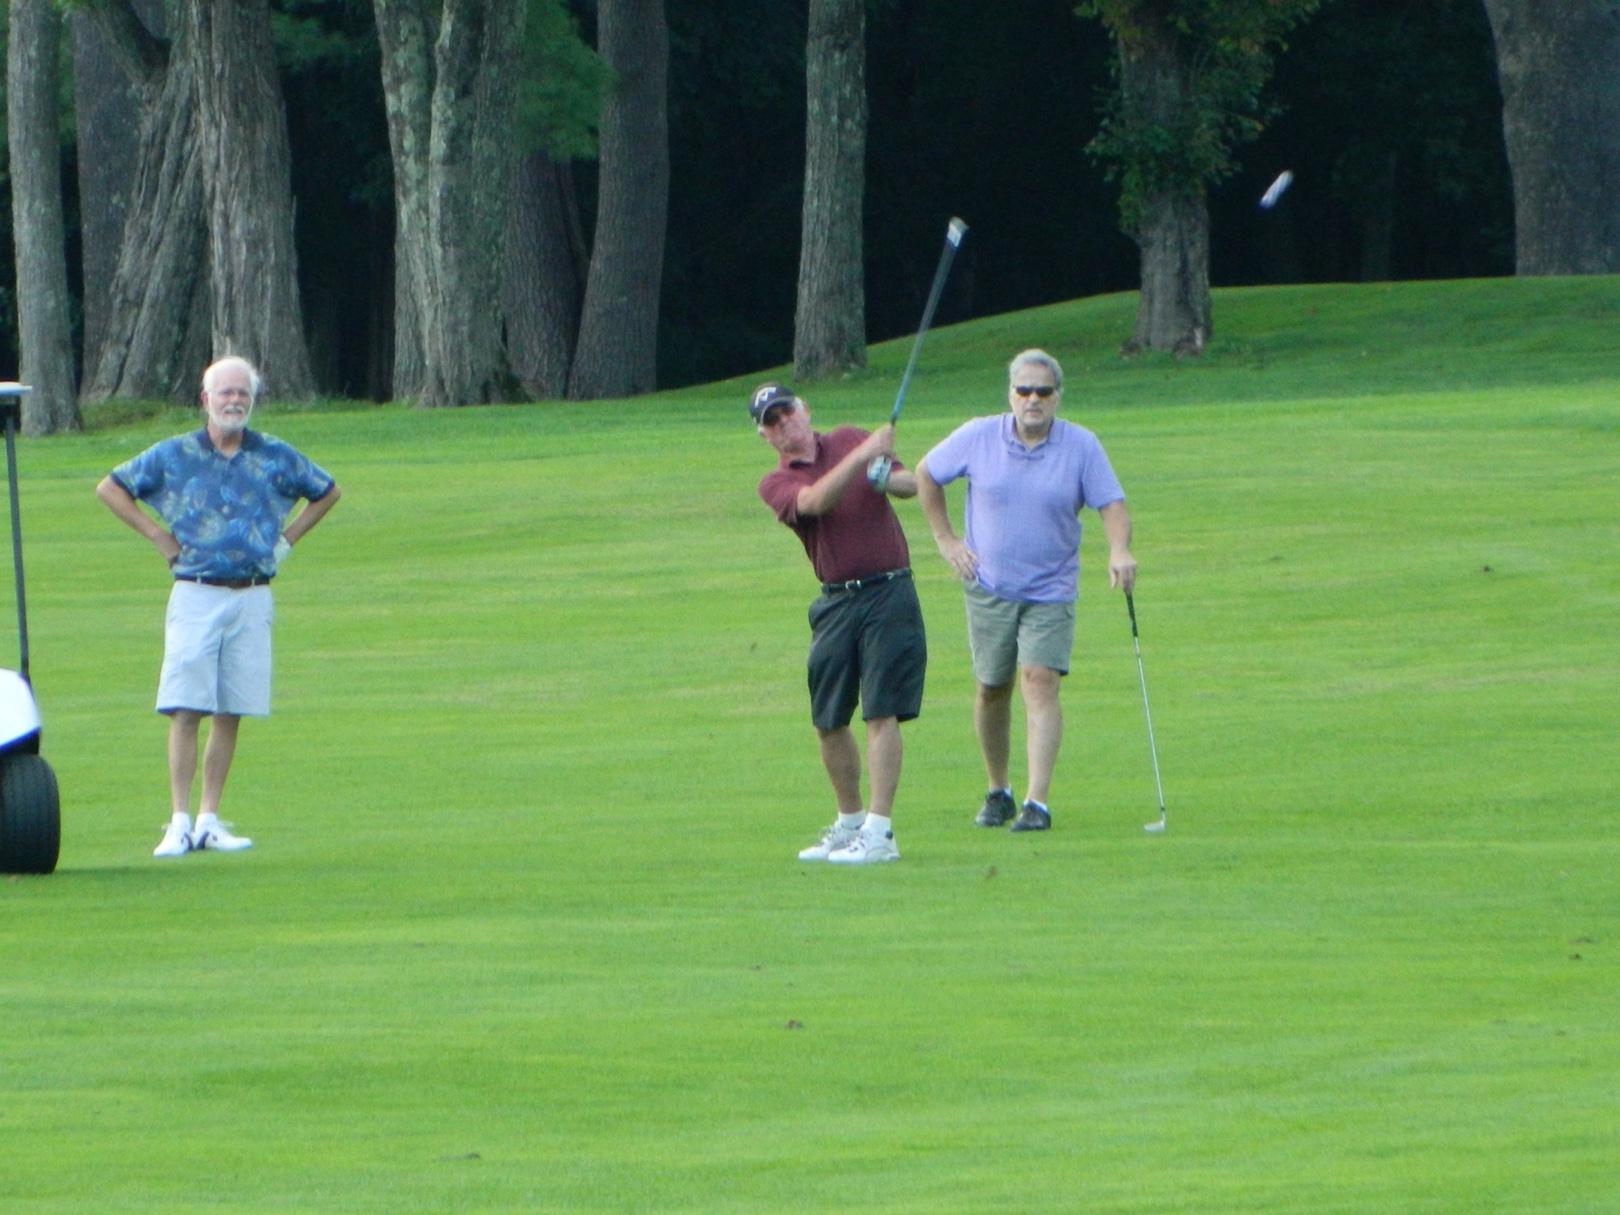 golf2018_33.JPG